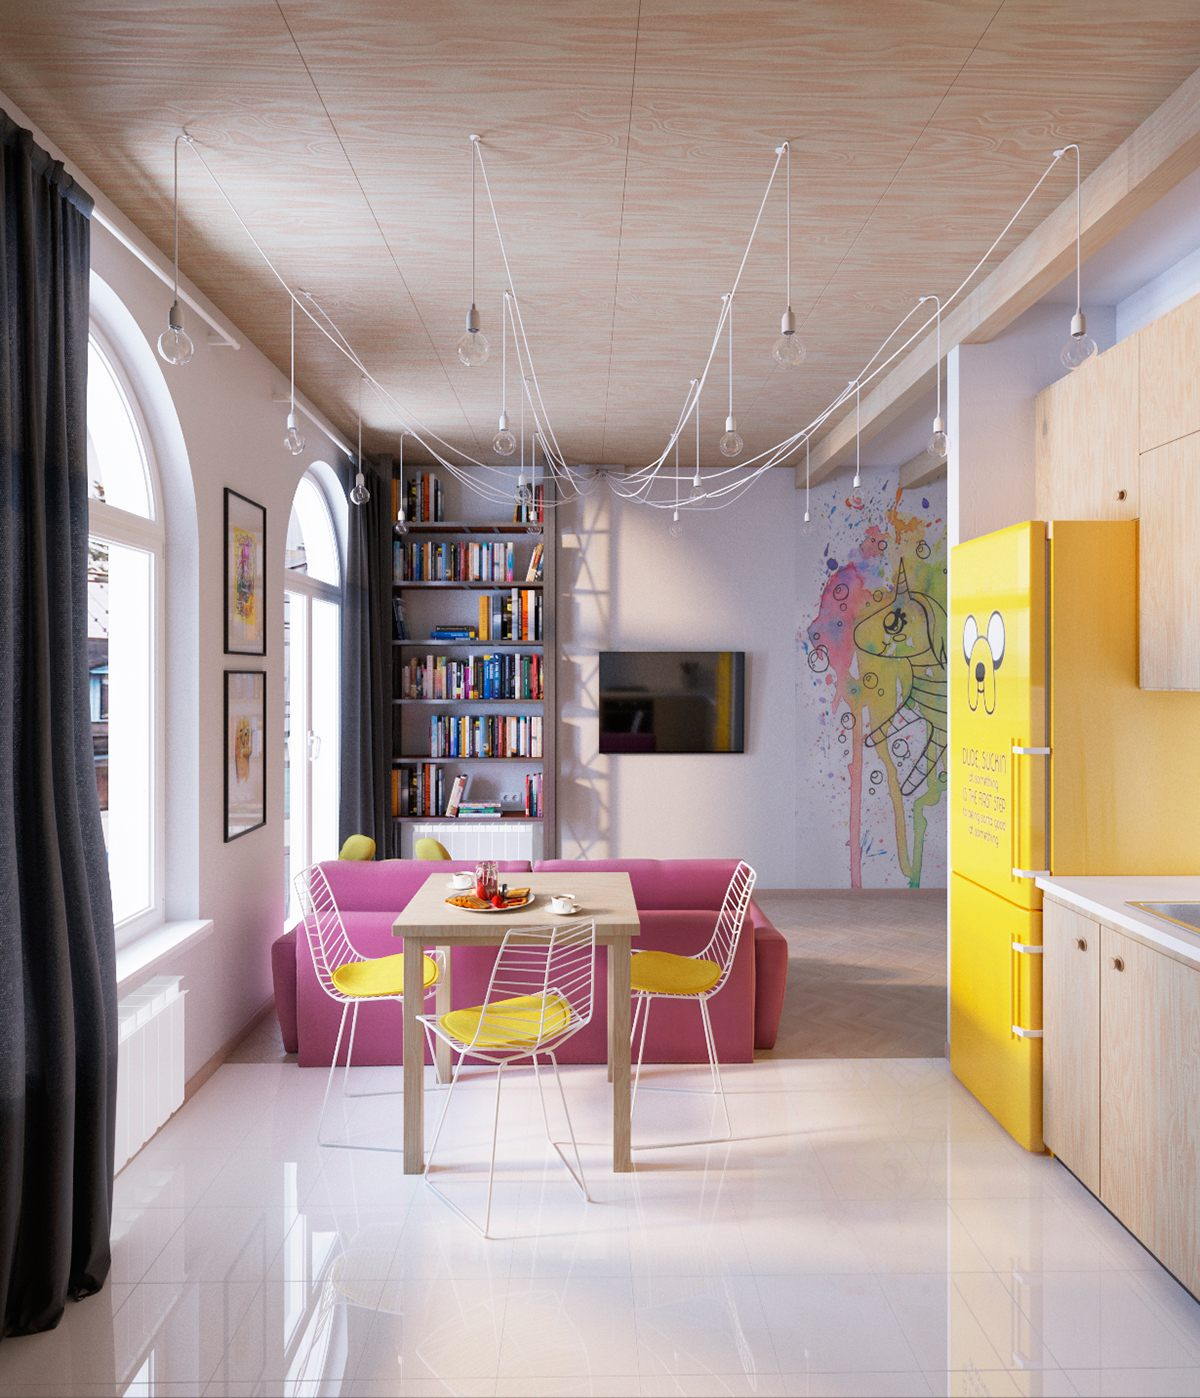 Colorful interior designs styles